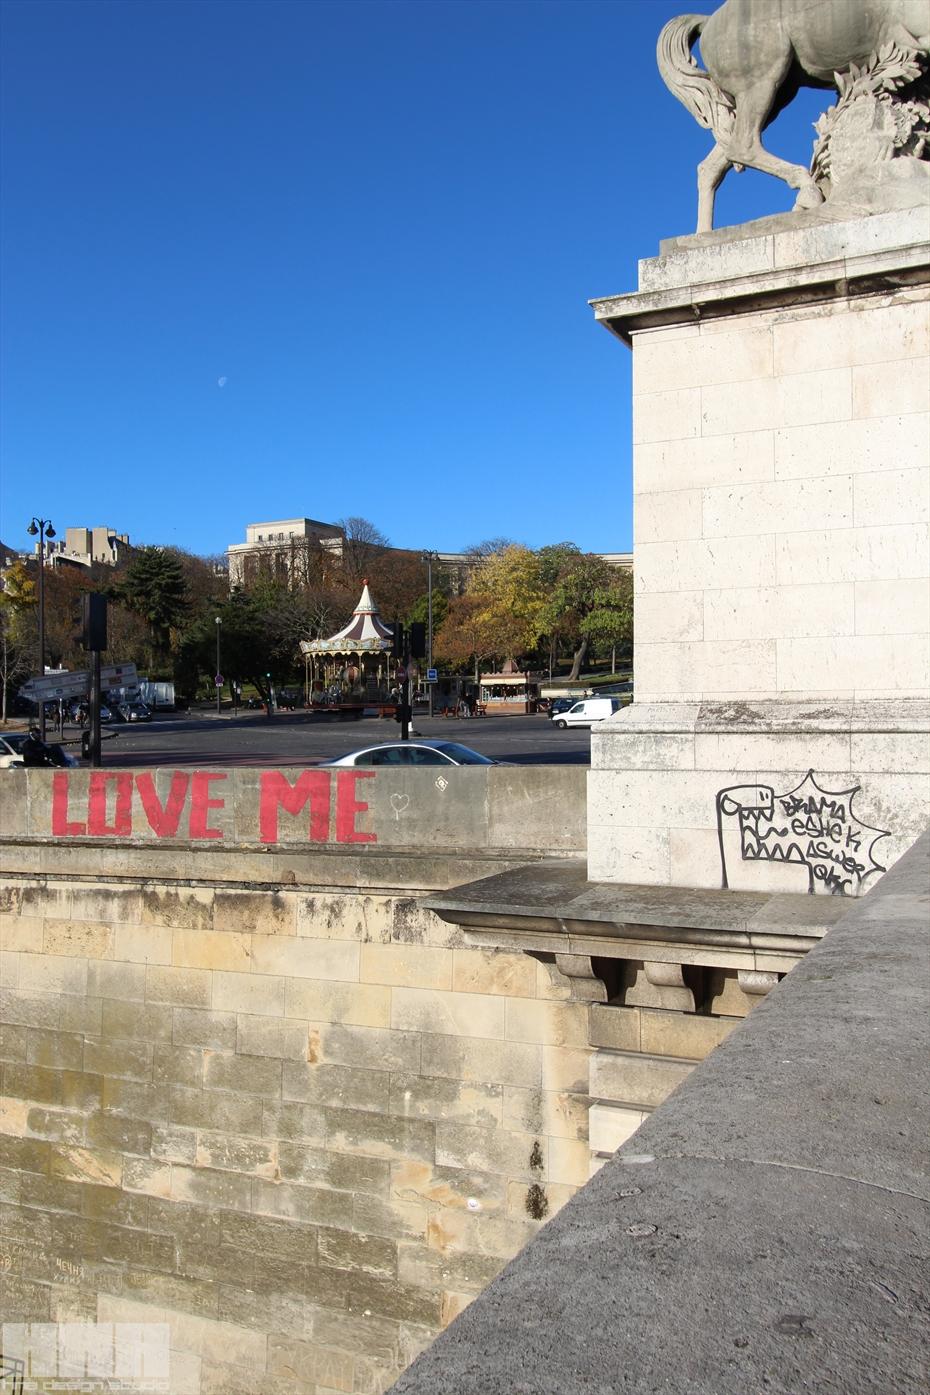 parizs street art 1b